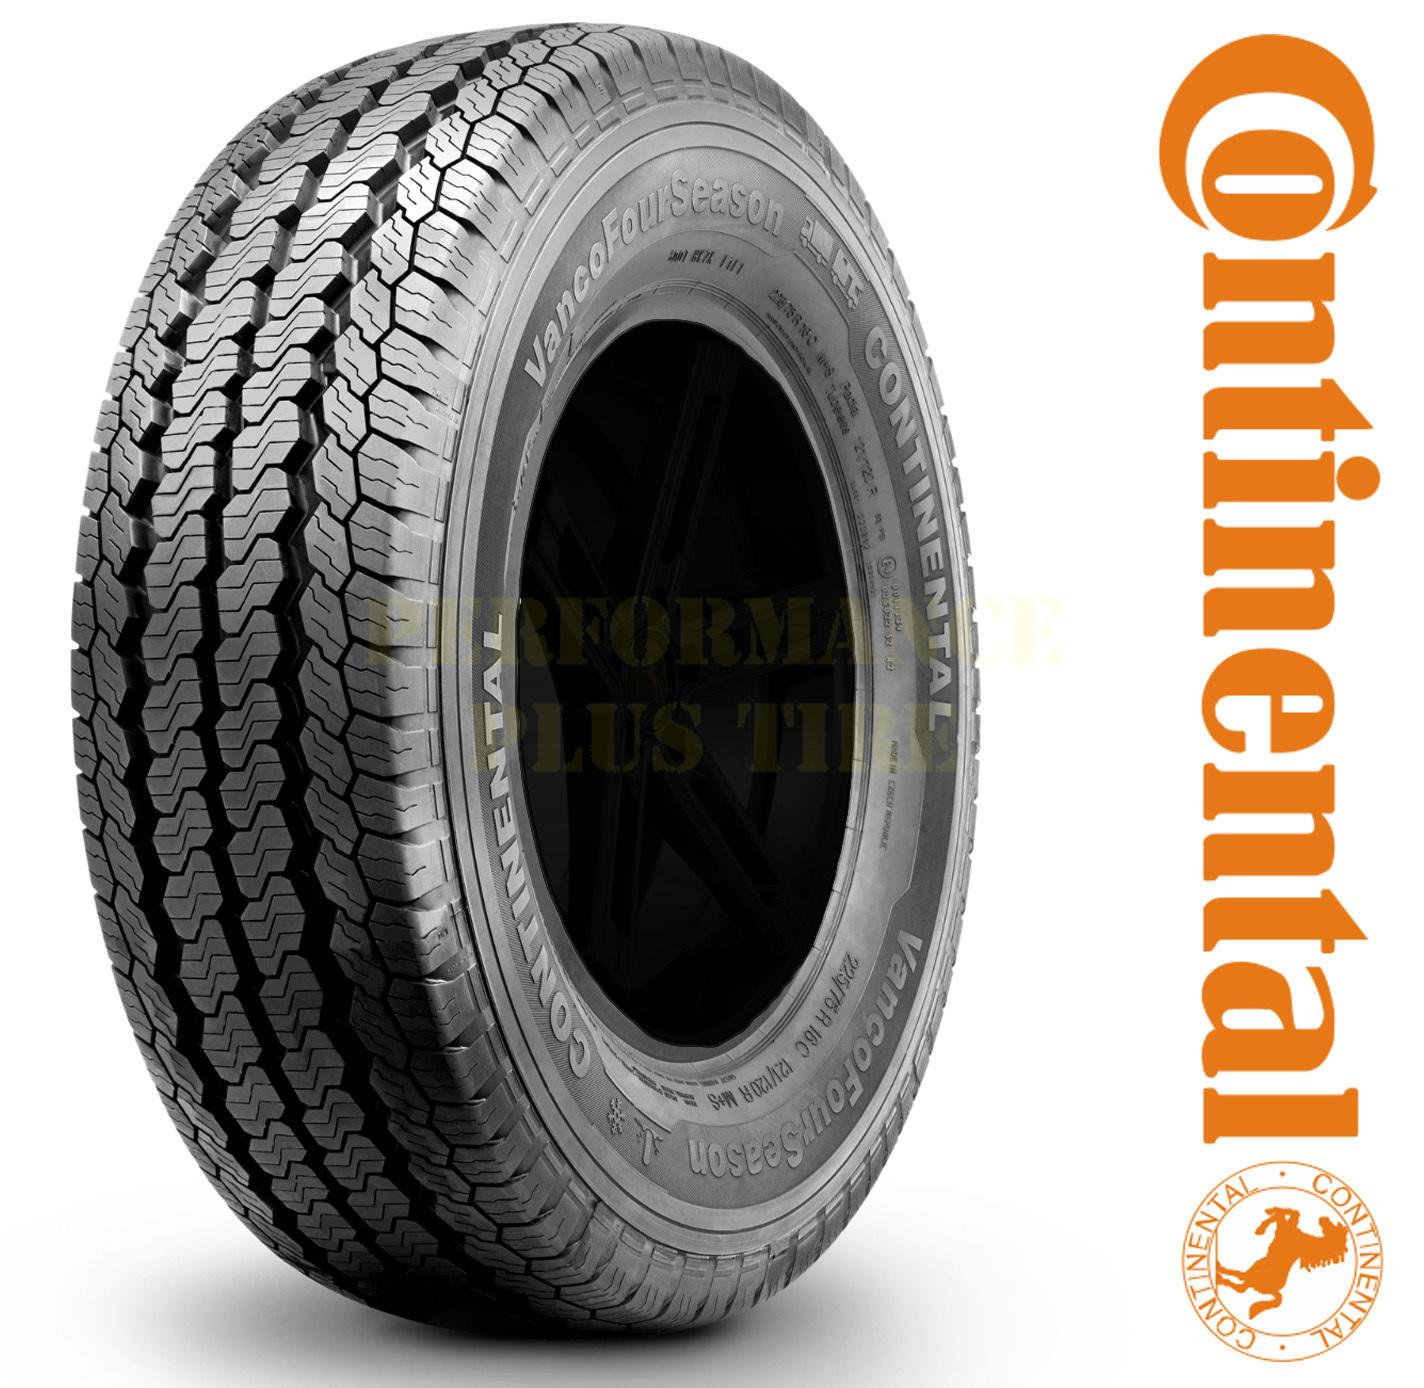 Continental Tires VancoFourSeason Passenger All Season Tire - LT205/75R16 110/108R 8 Ply